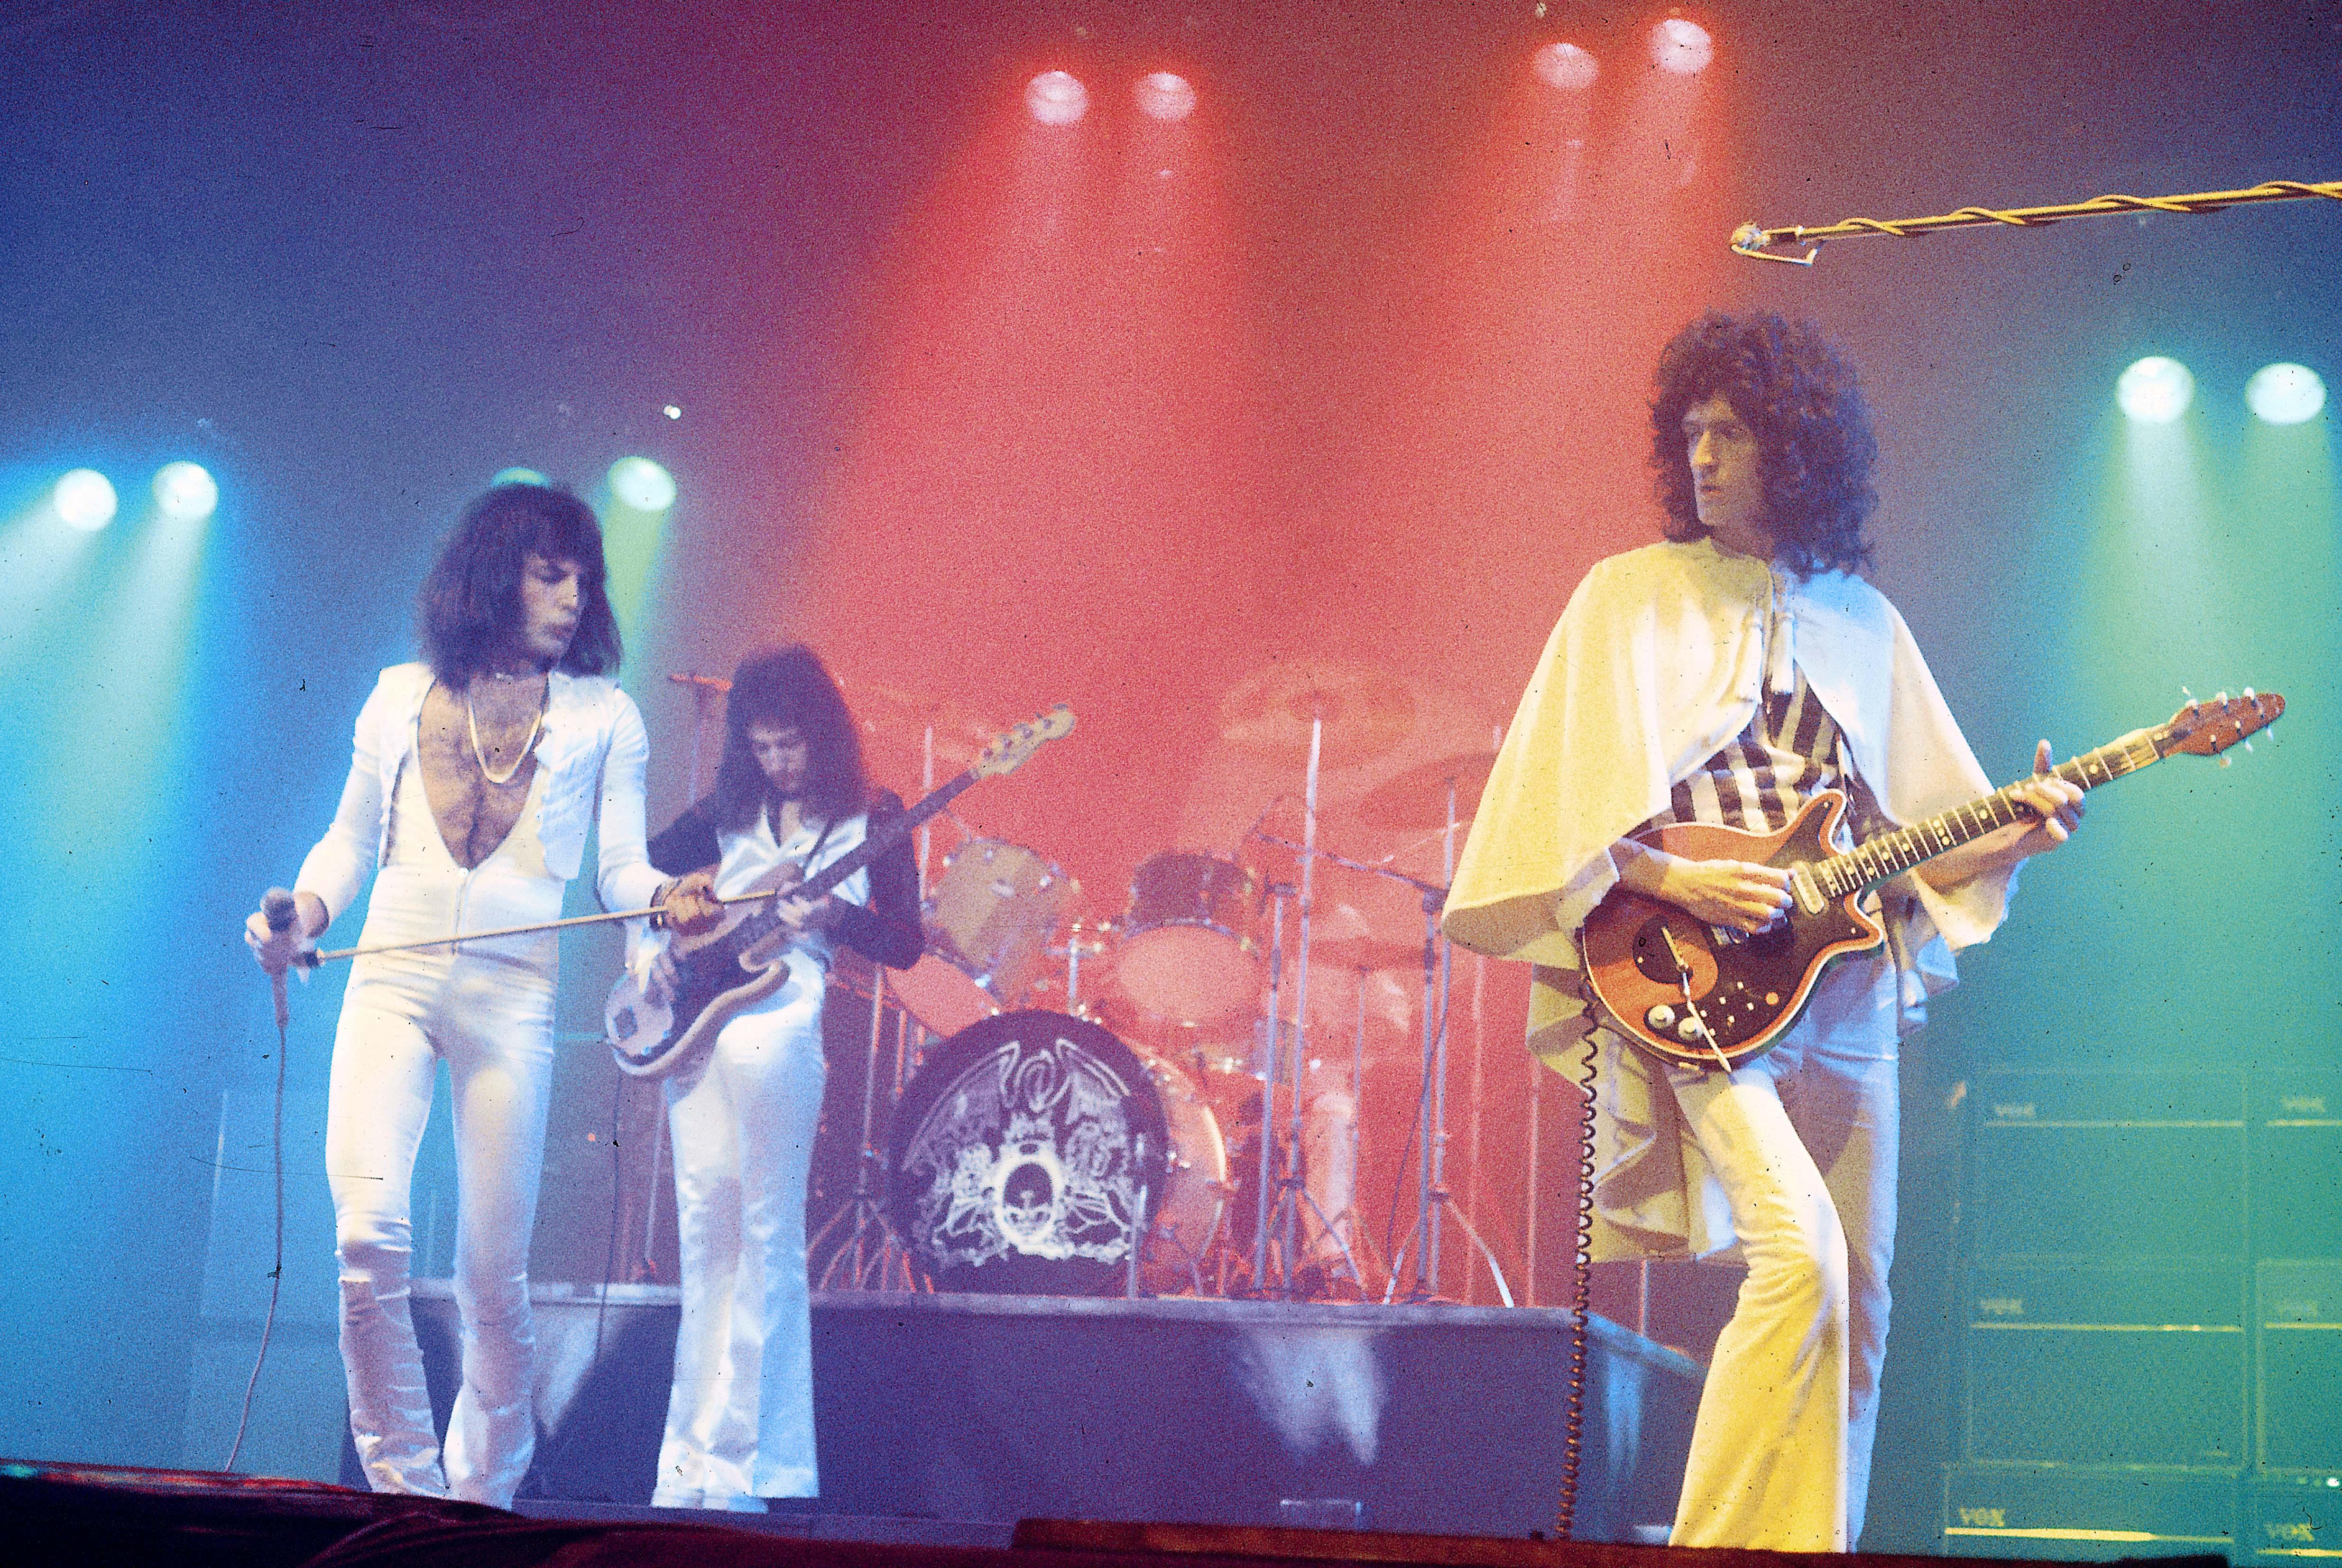 Brian May Talks Queen's 1975 Concert Film, Performing 'Bohemian Rhapsody' Live